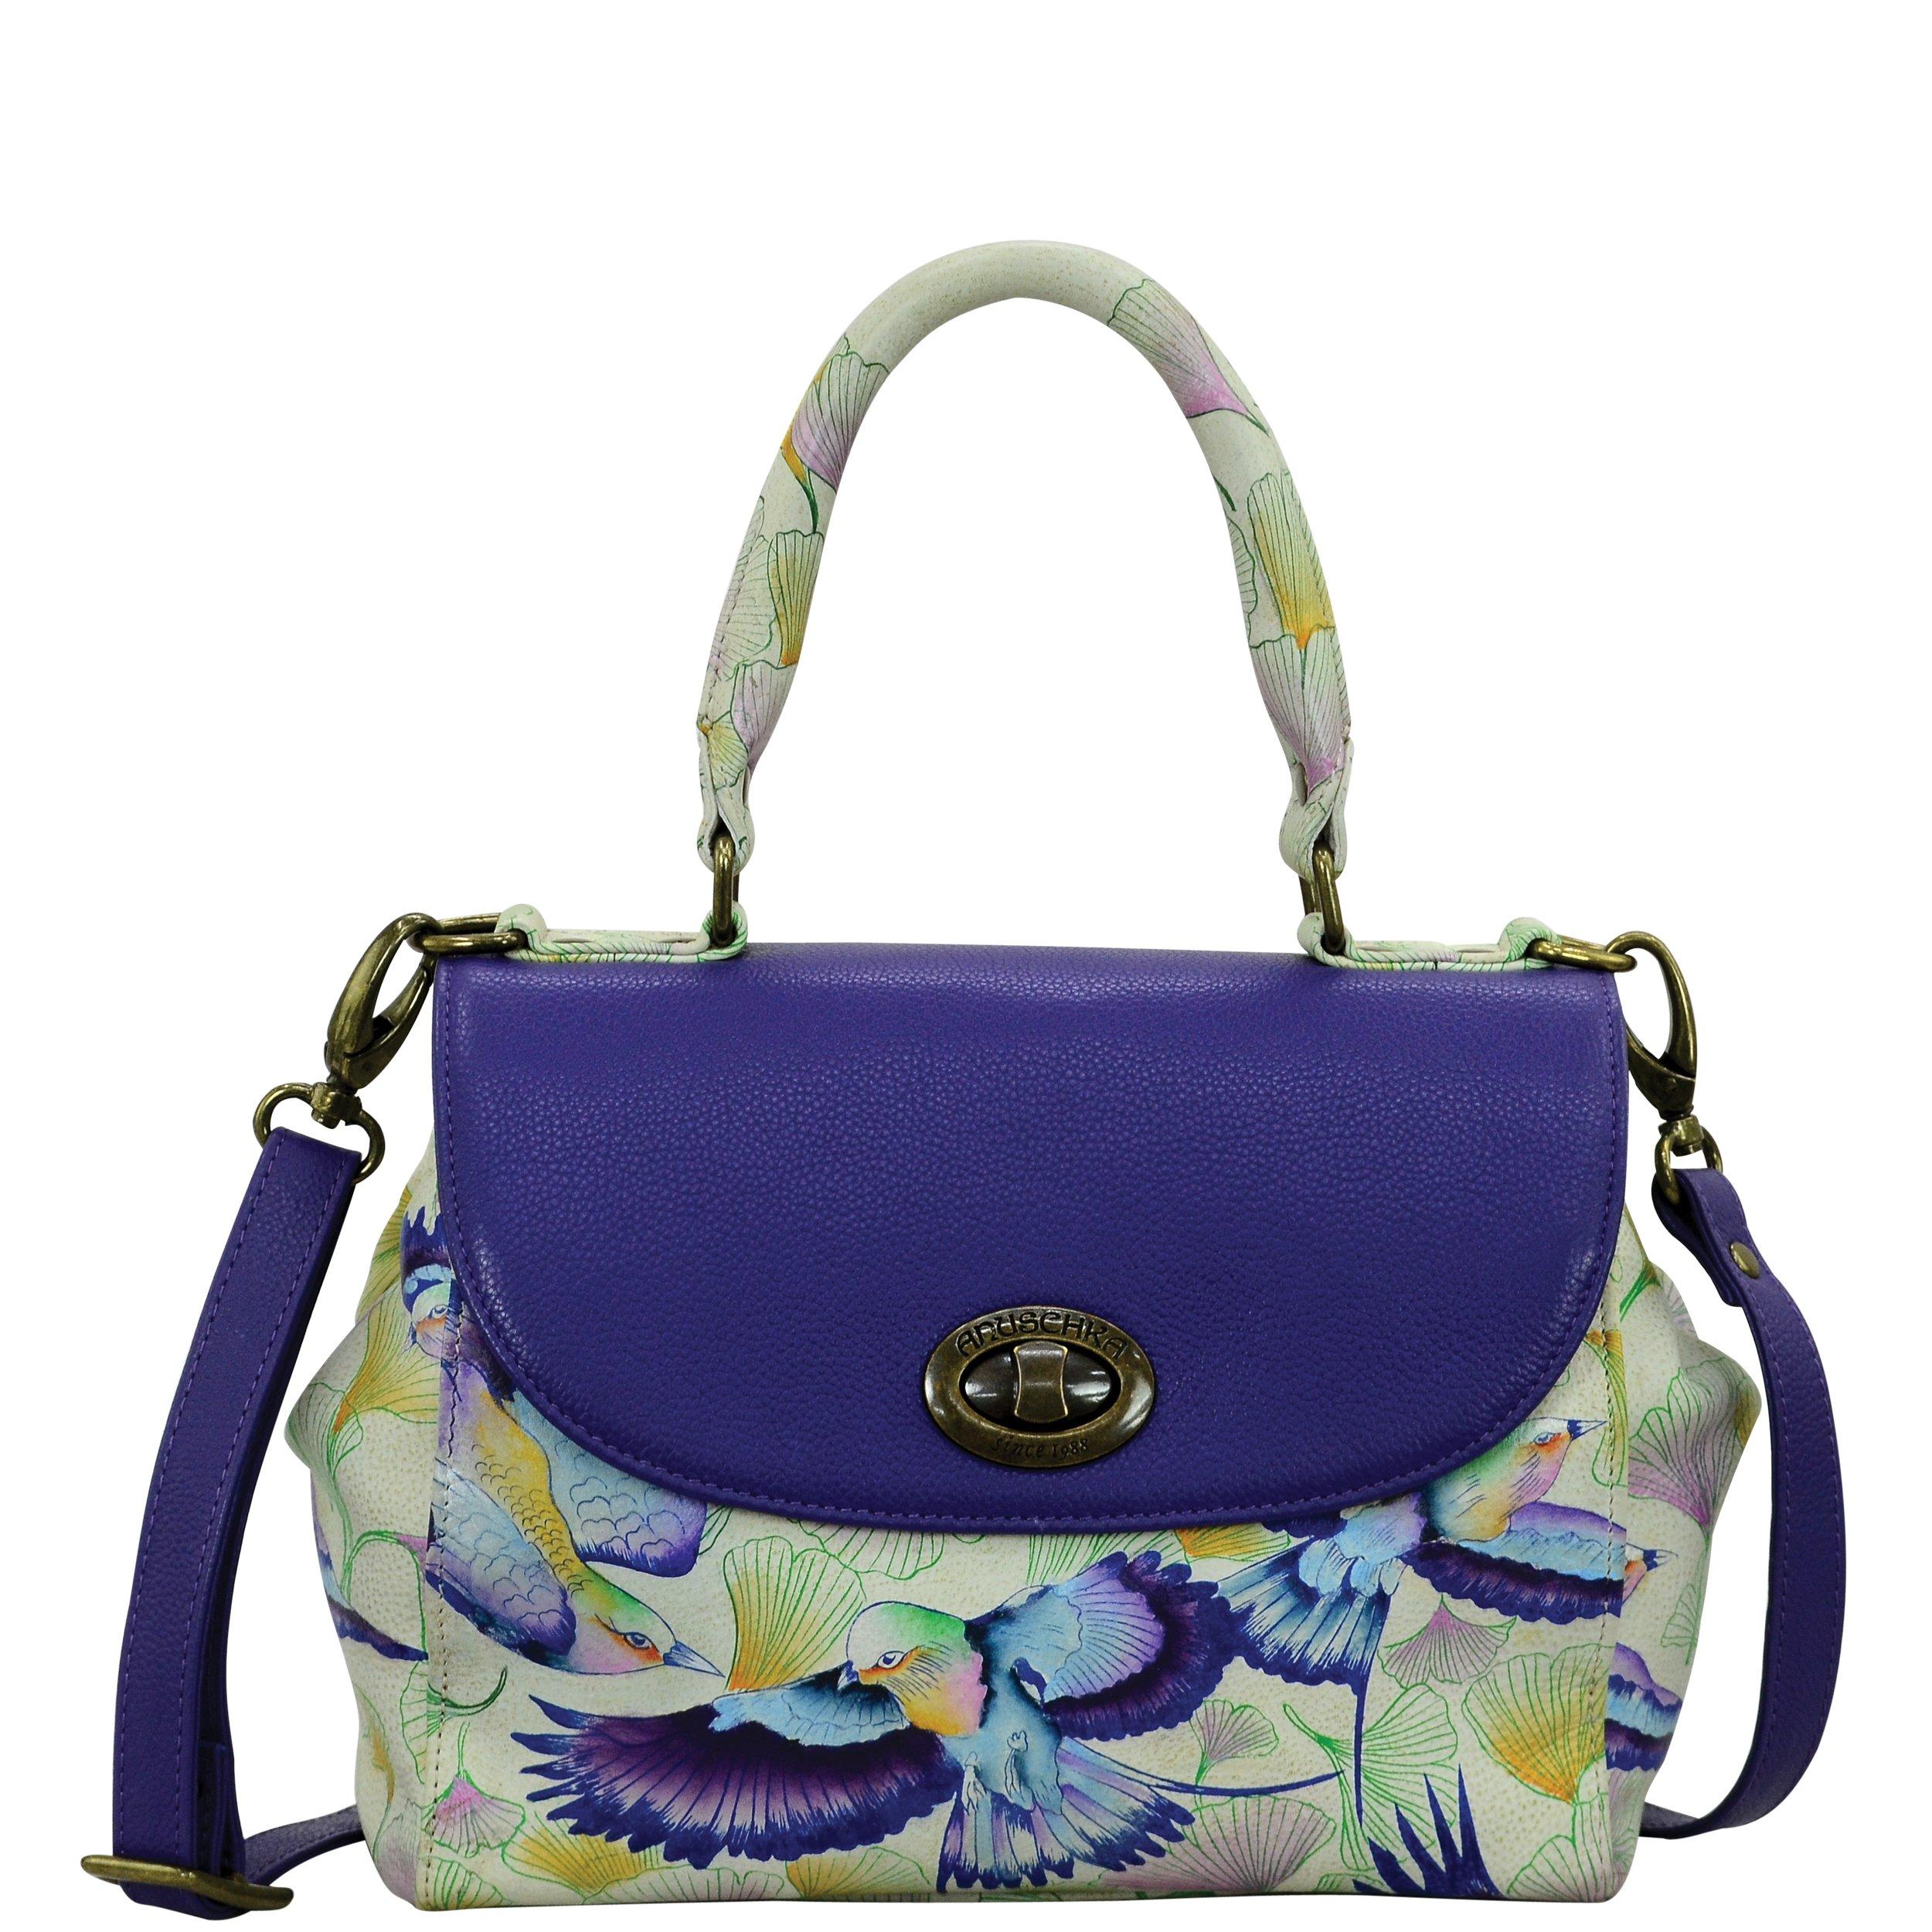 Anuschka Hand Painted Designer Leather Handbags for Women- Medium Flap Satchel ( Wings of Hope 624 WHP ))